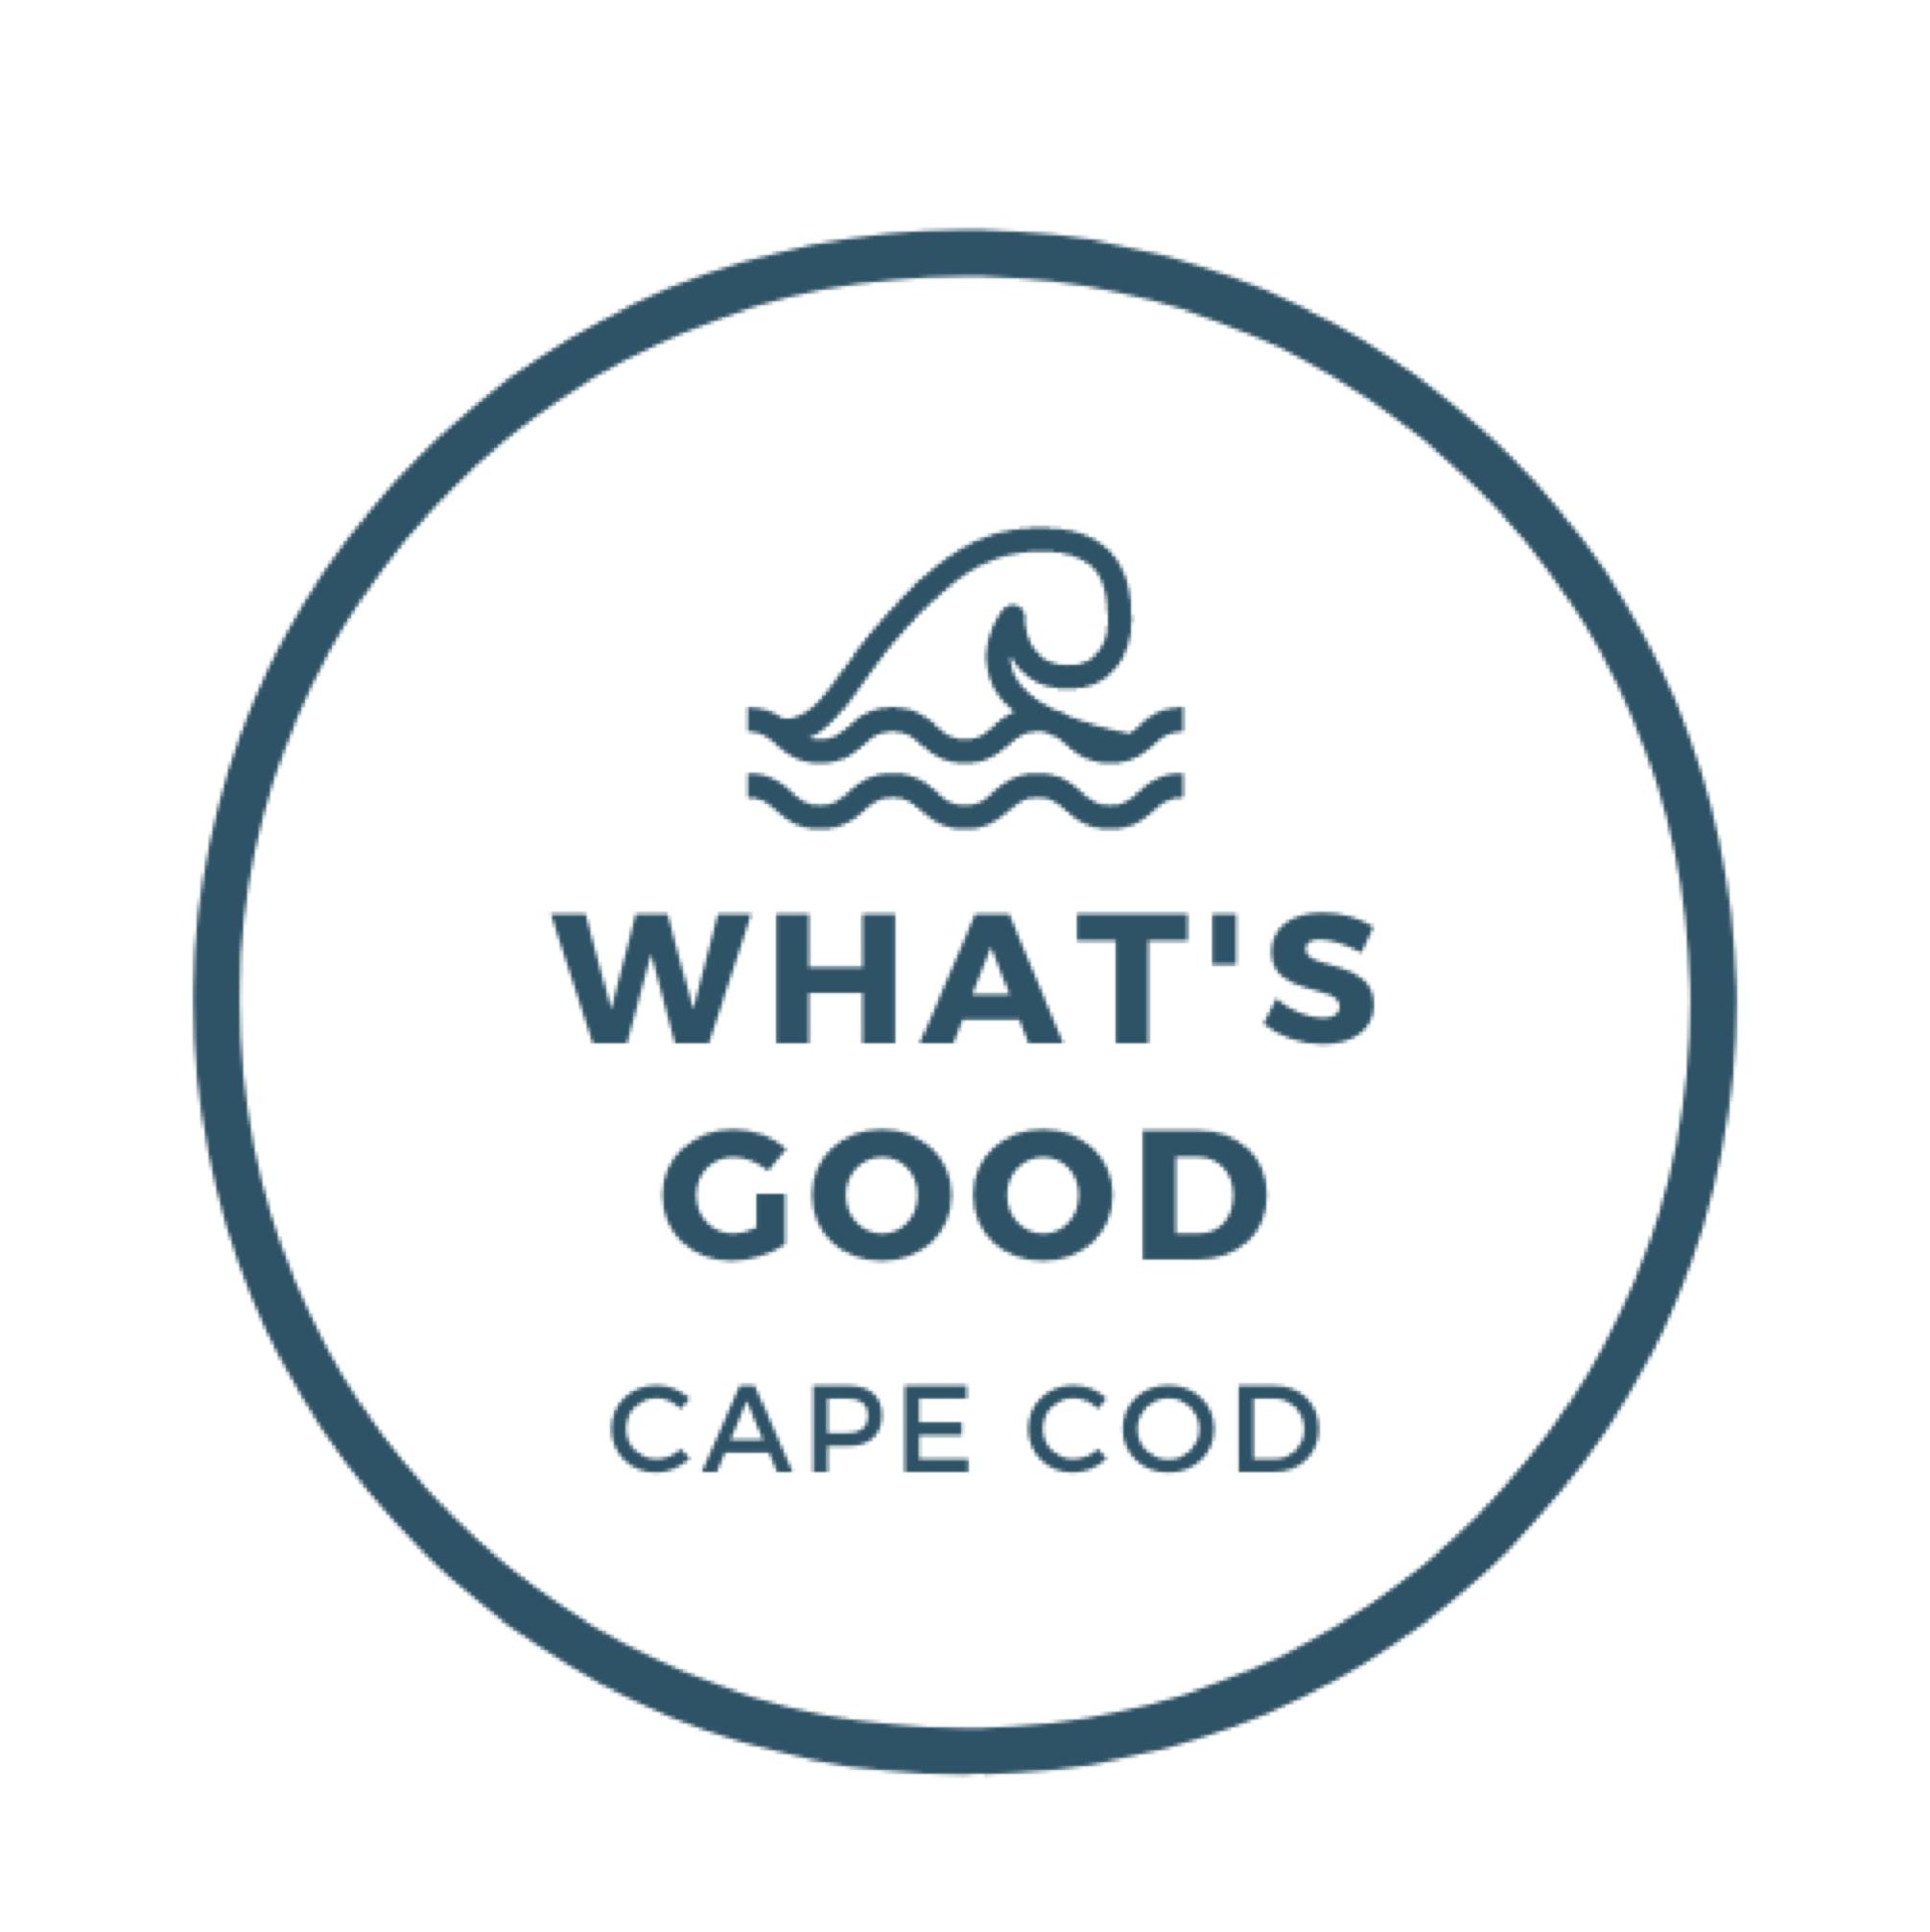 What's Good Cape Cod